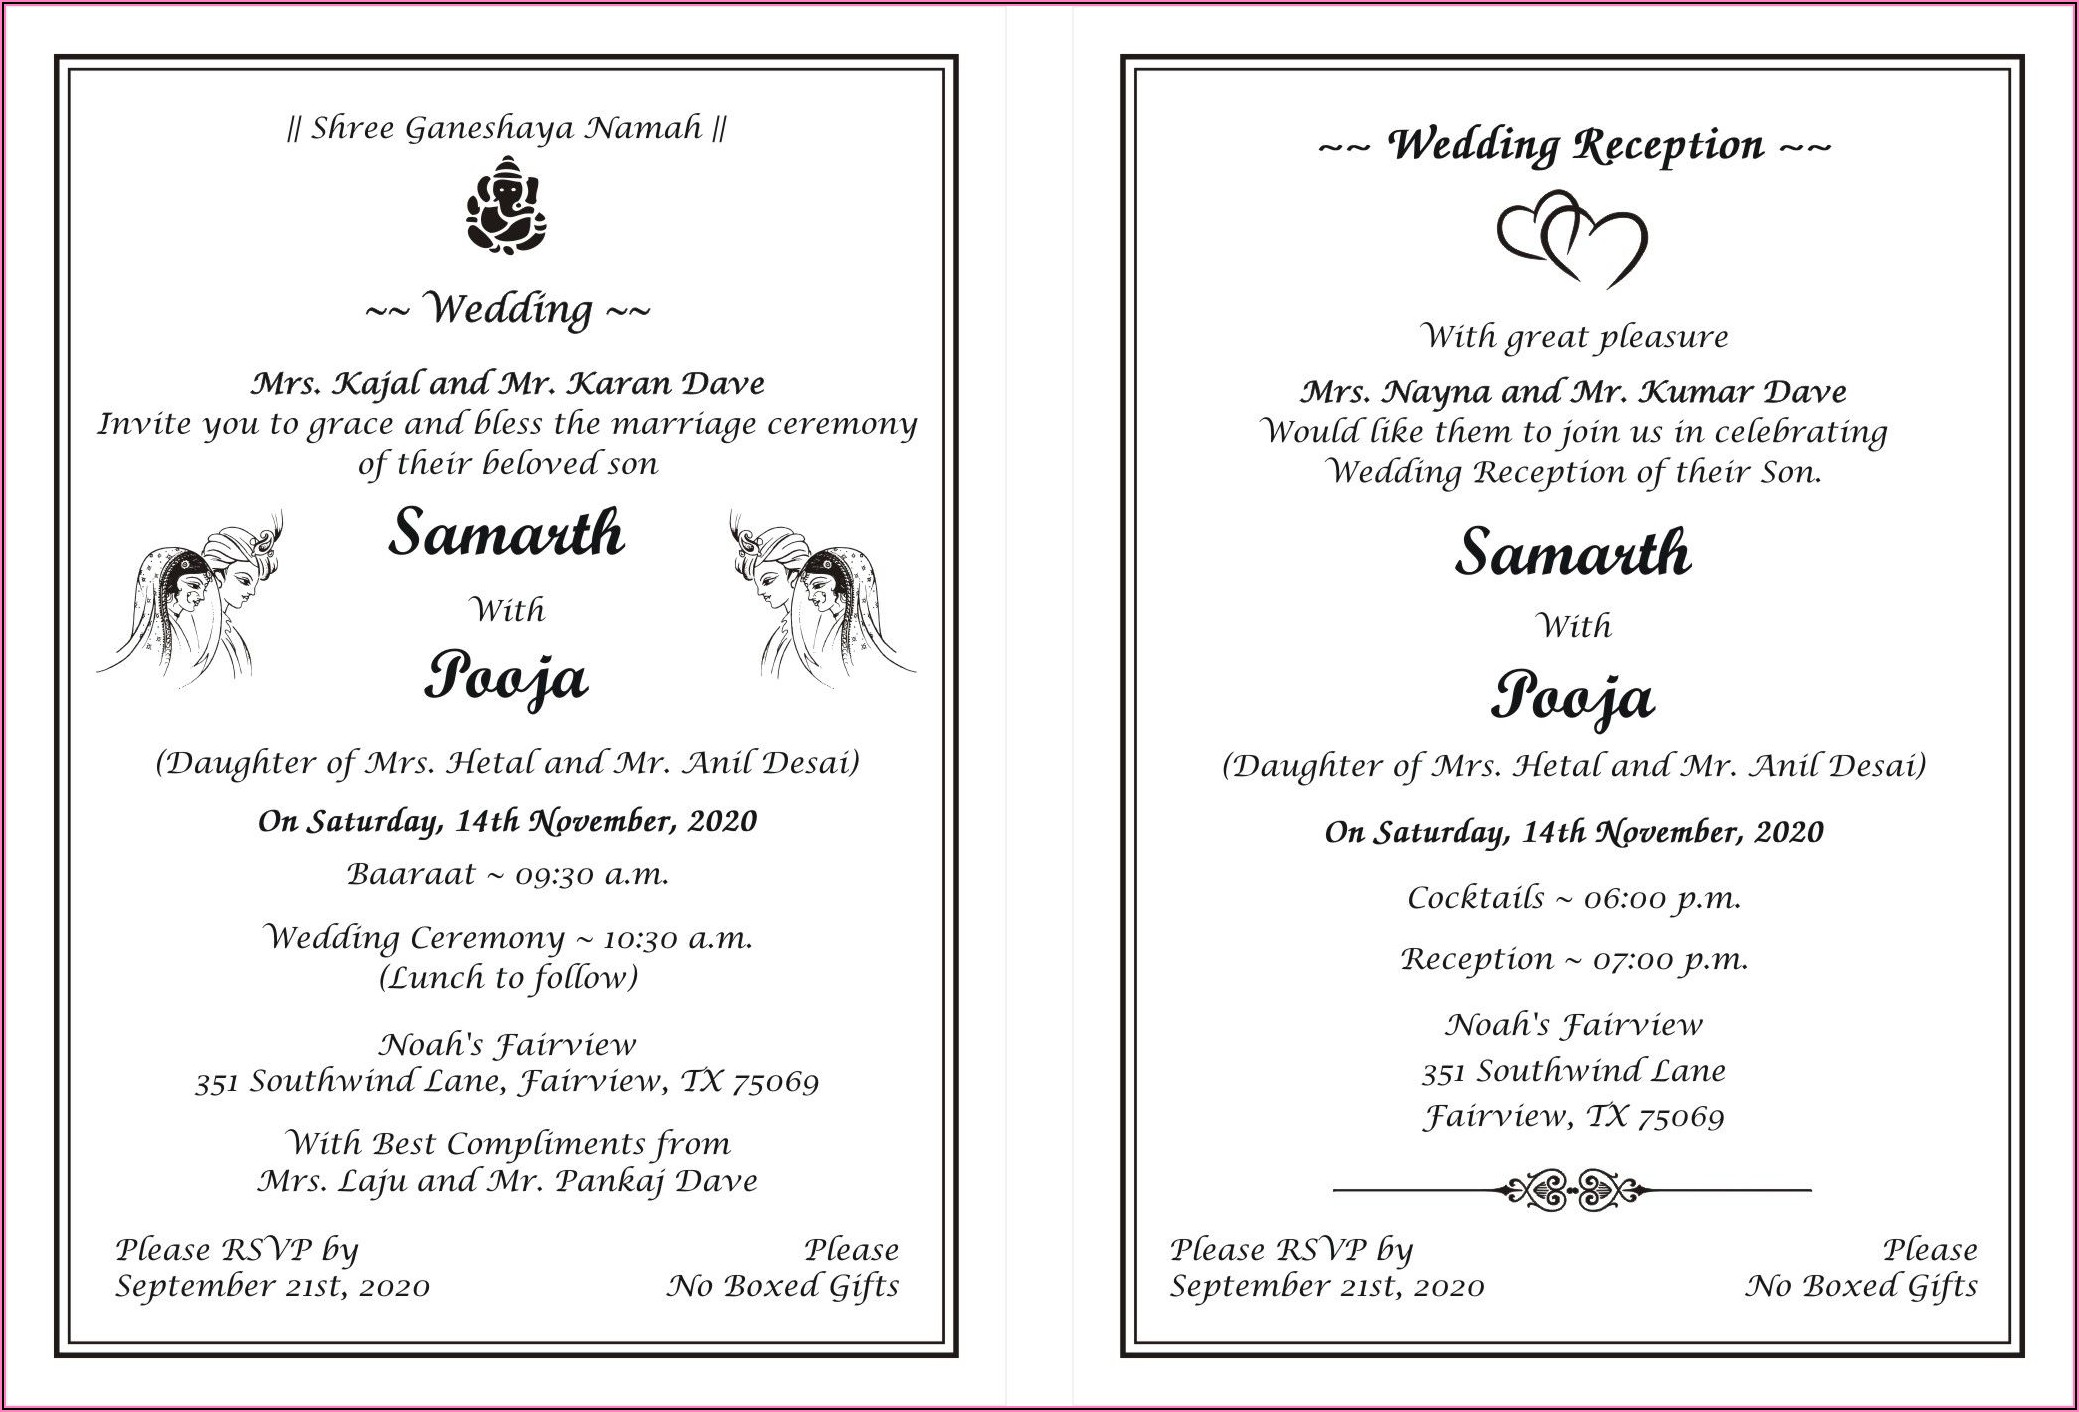 Hindu Marriage Invitation Card Format In Word